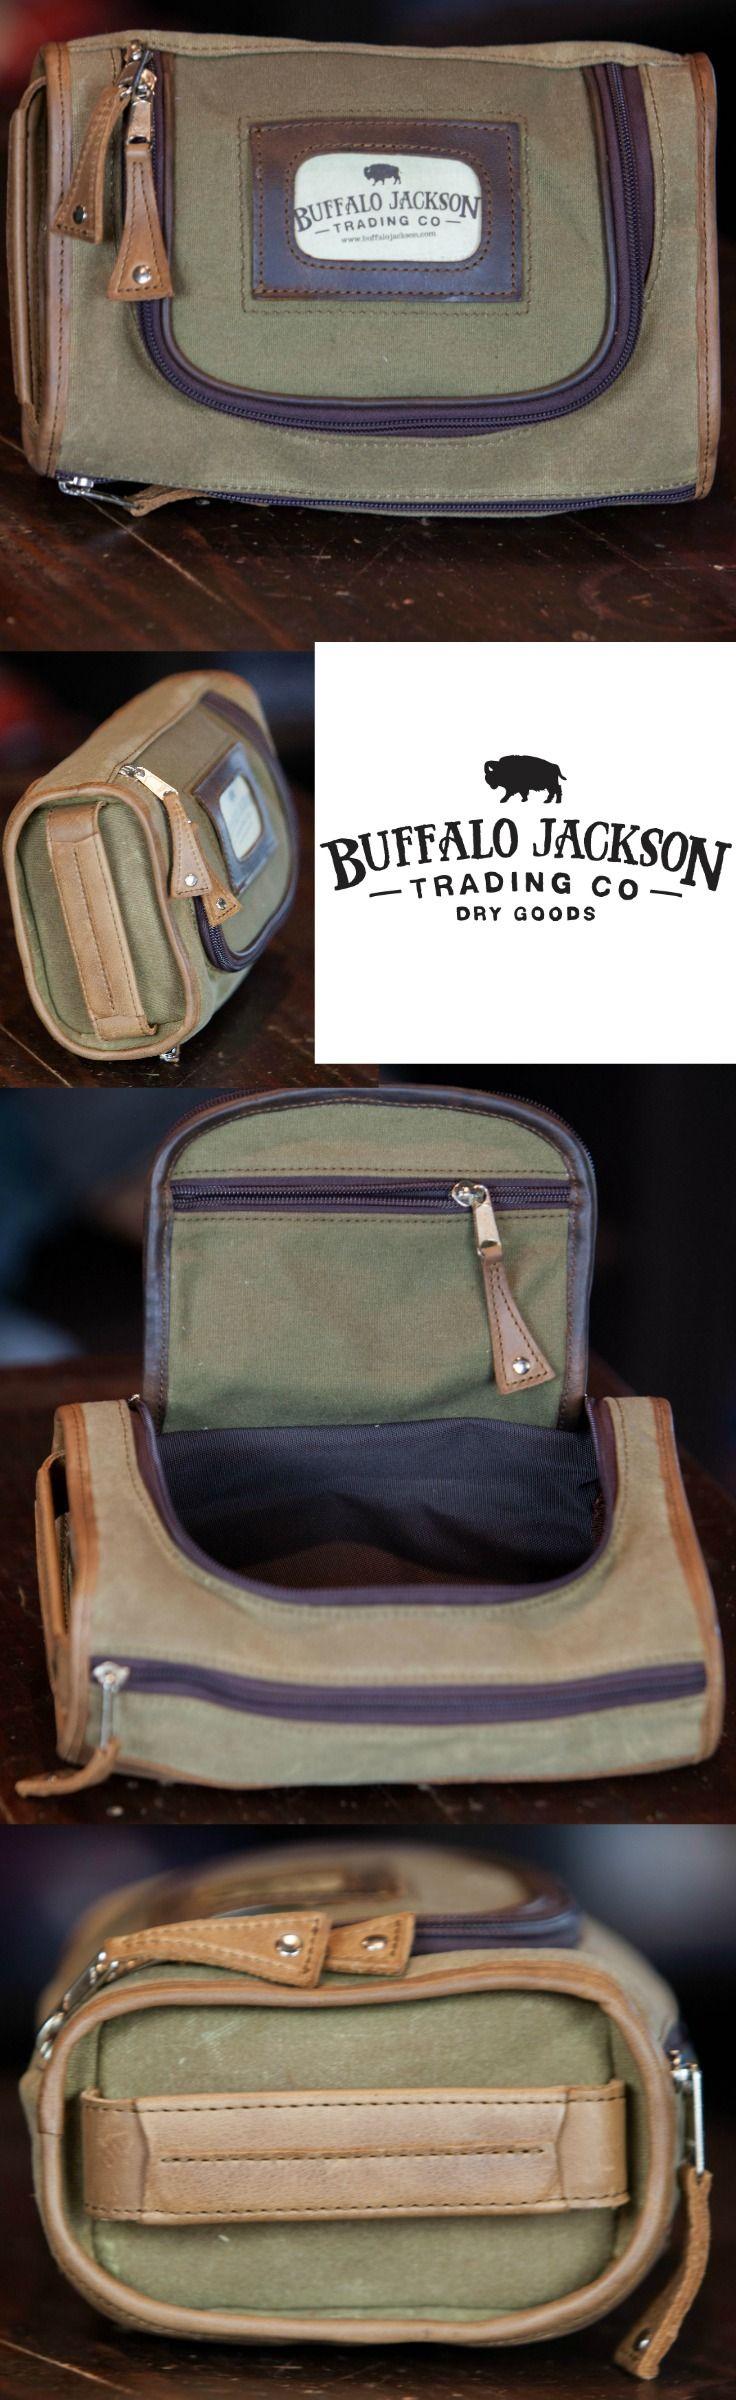 Waxed Canvas and Leather Mens Toiletry Bag | Dopp Kit for Men | Shaving Kit Bag | Mens Travel Bag